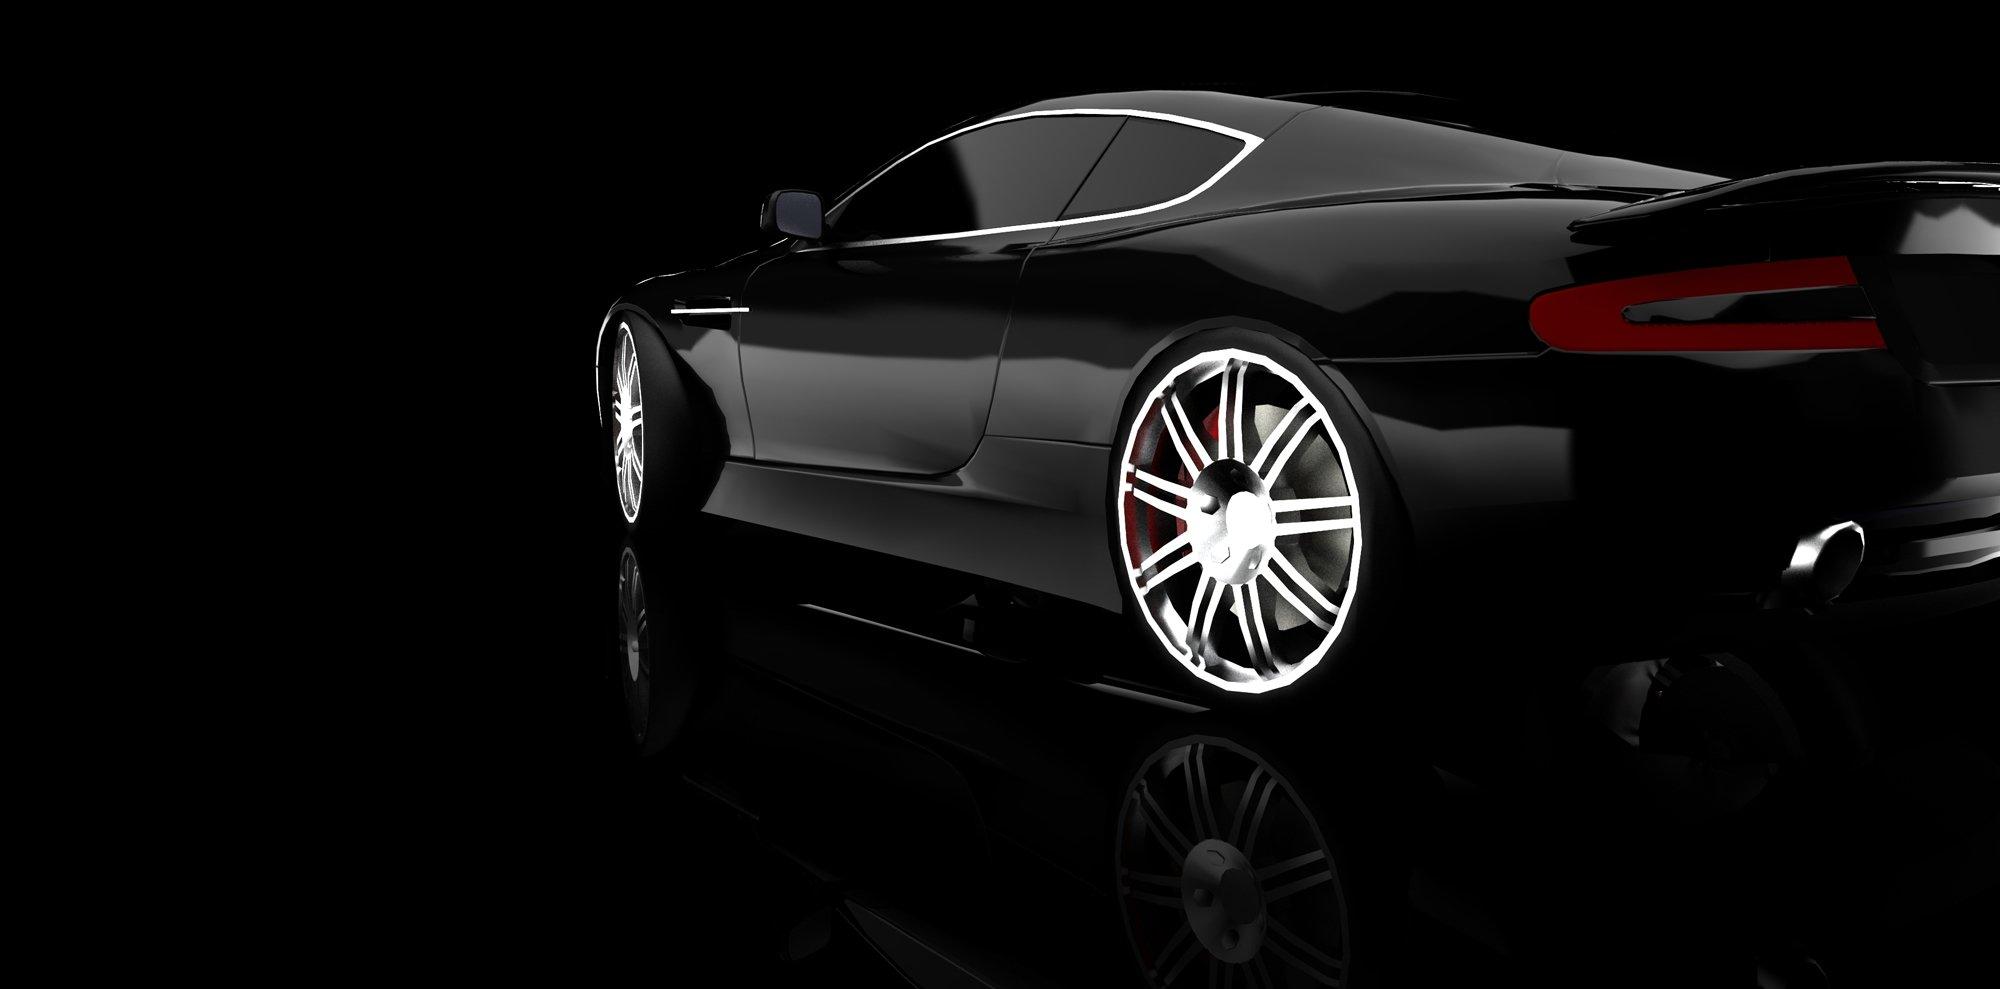 macchina nera lucida